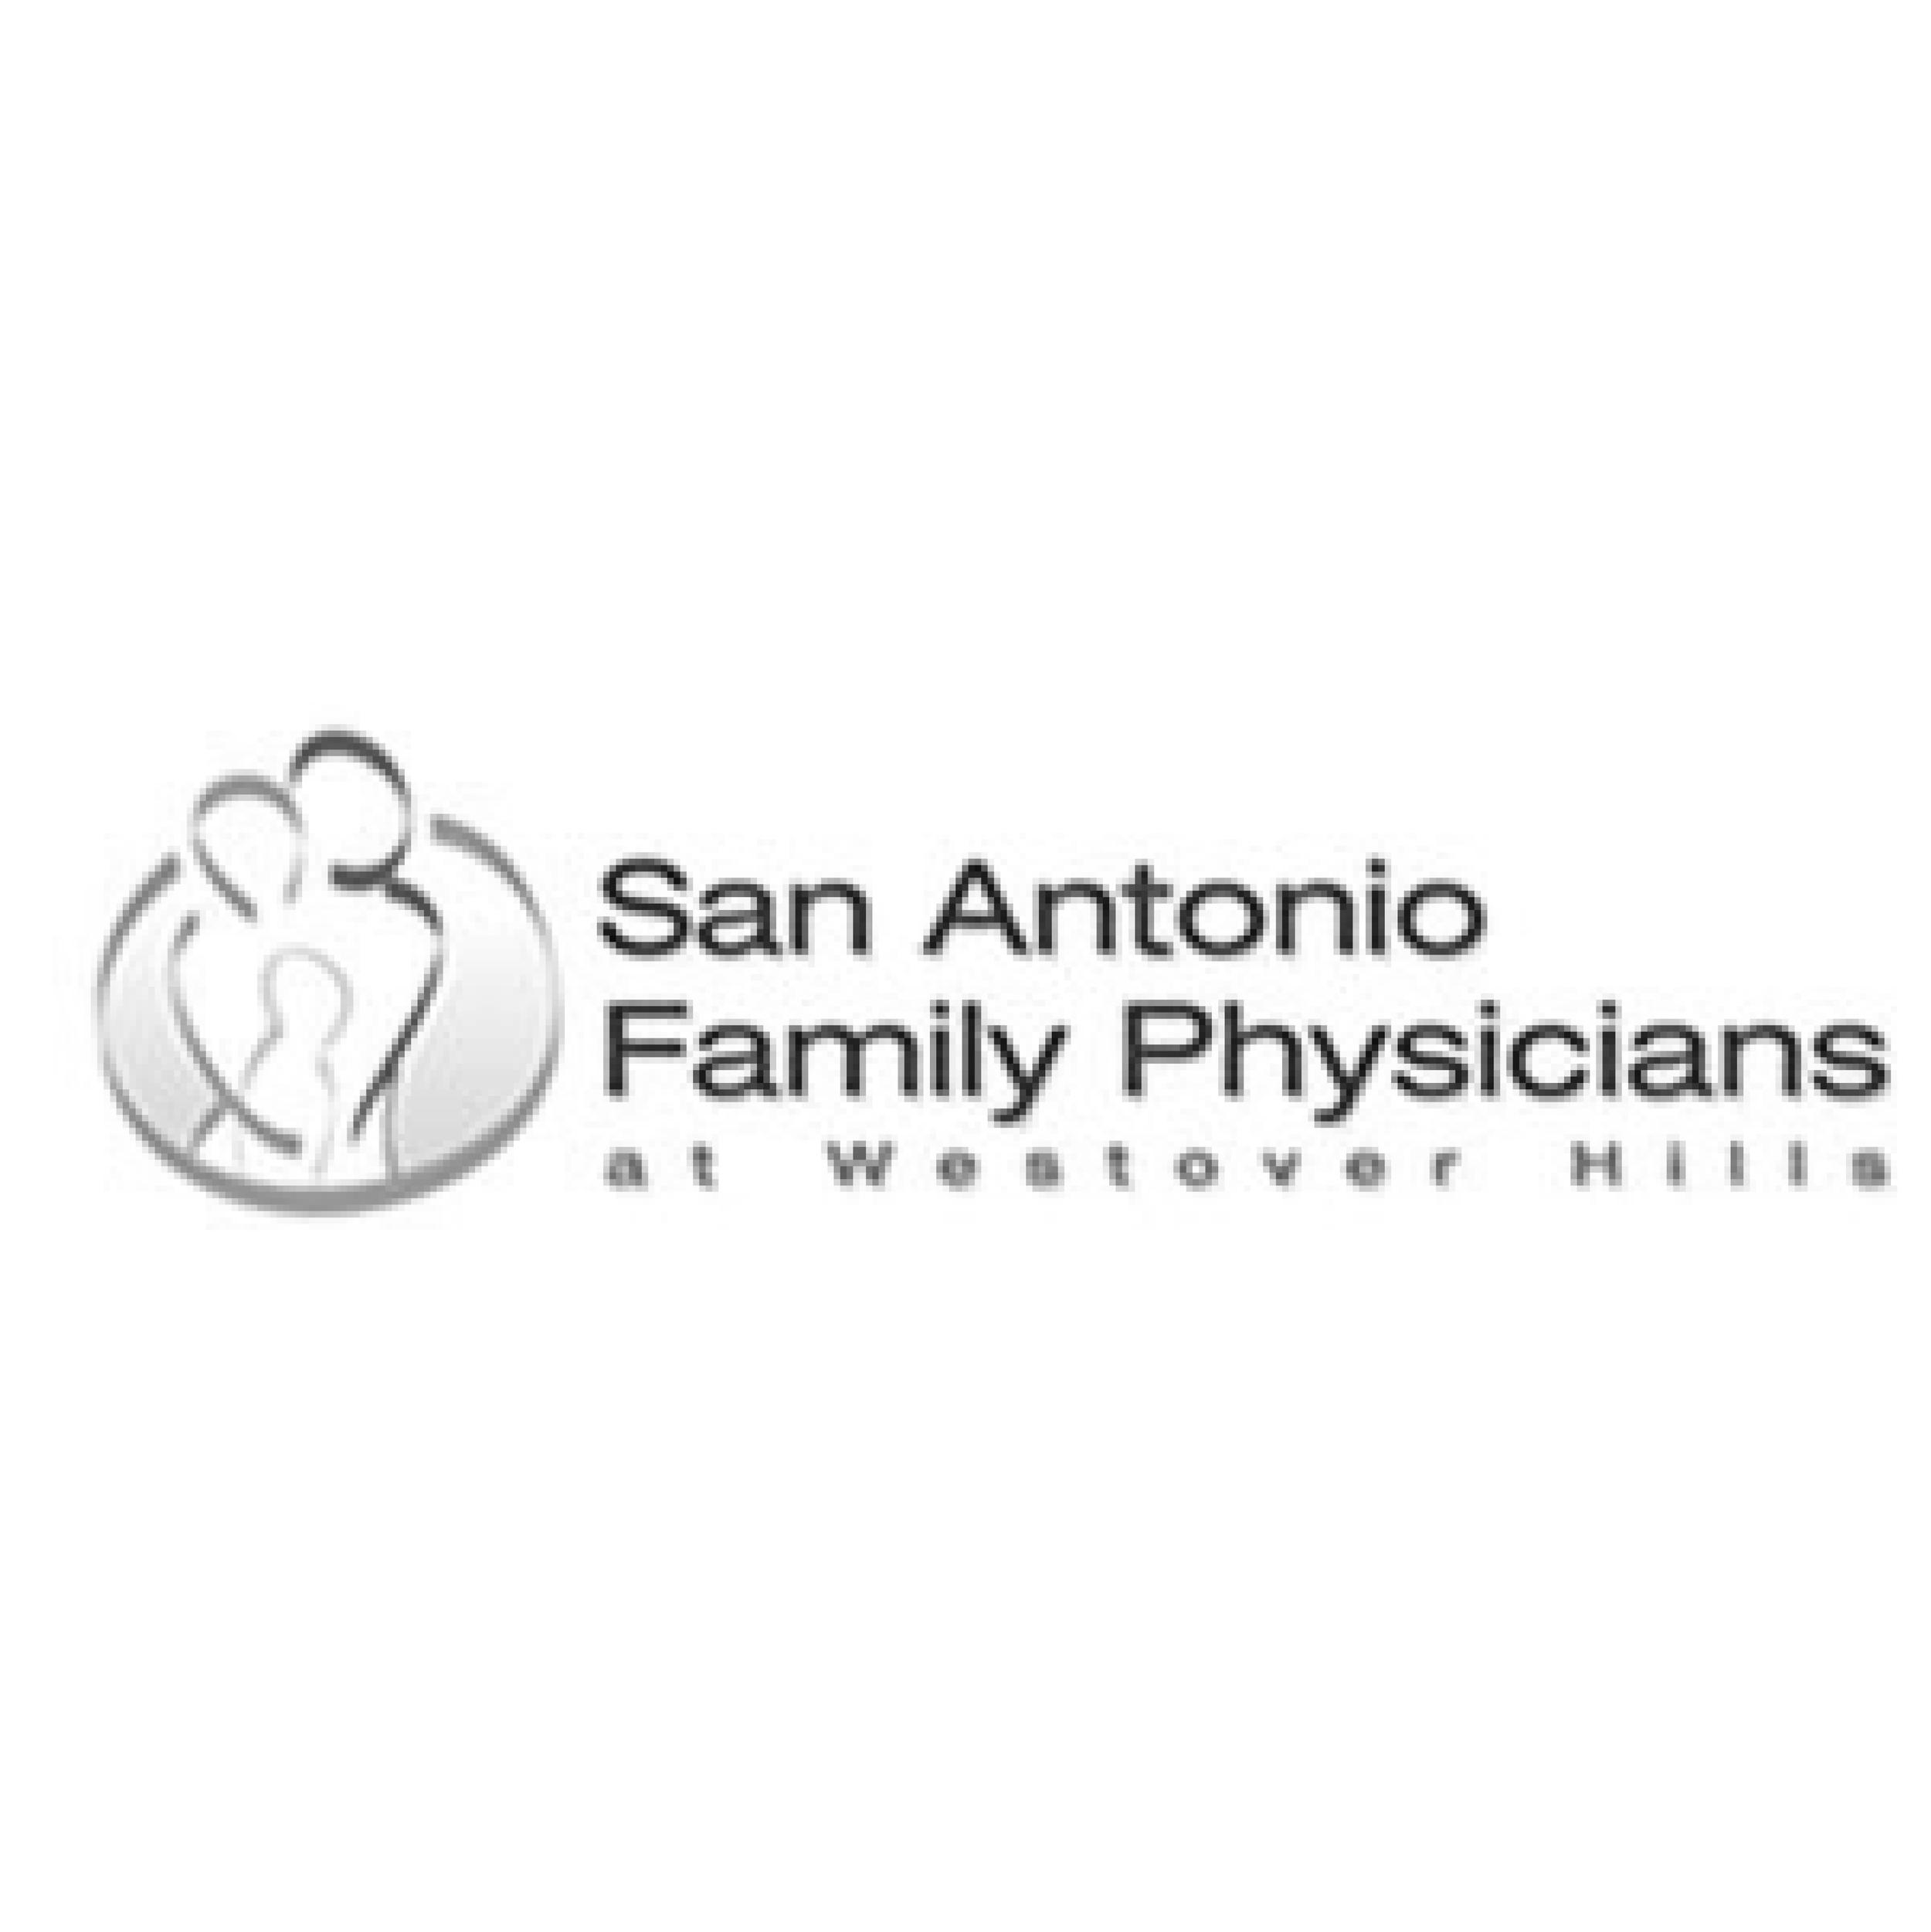 San Antonio Family Physicians